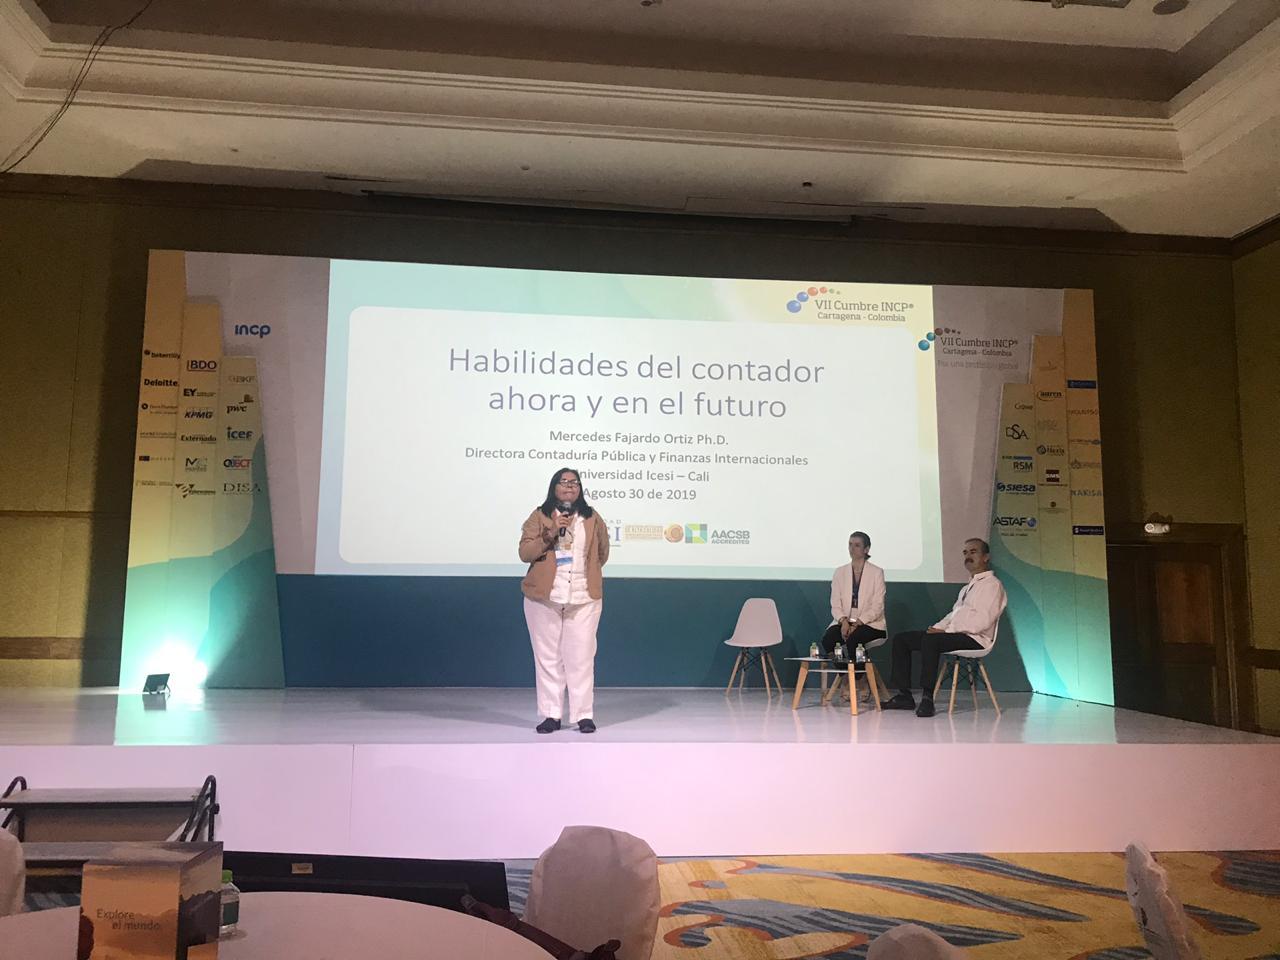 VII Cumbre INCP 2019